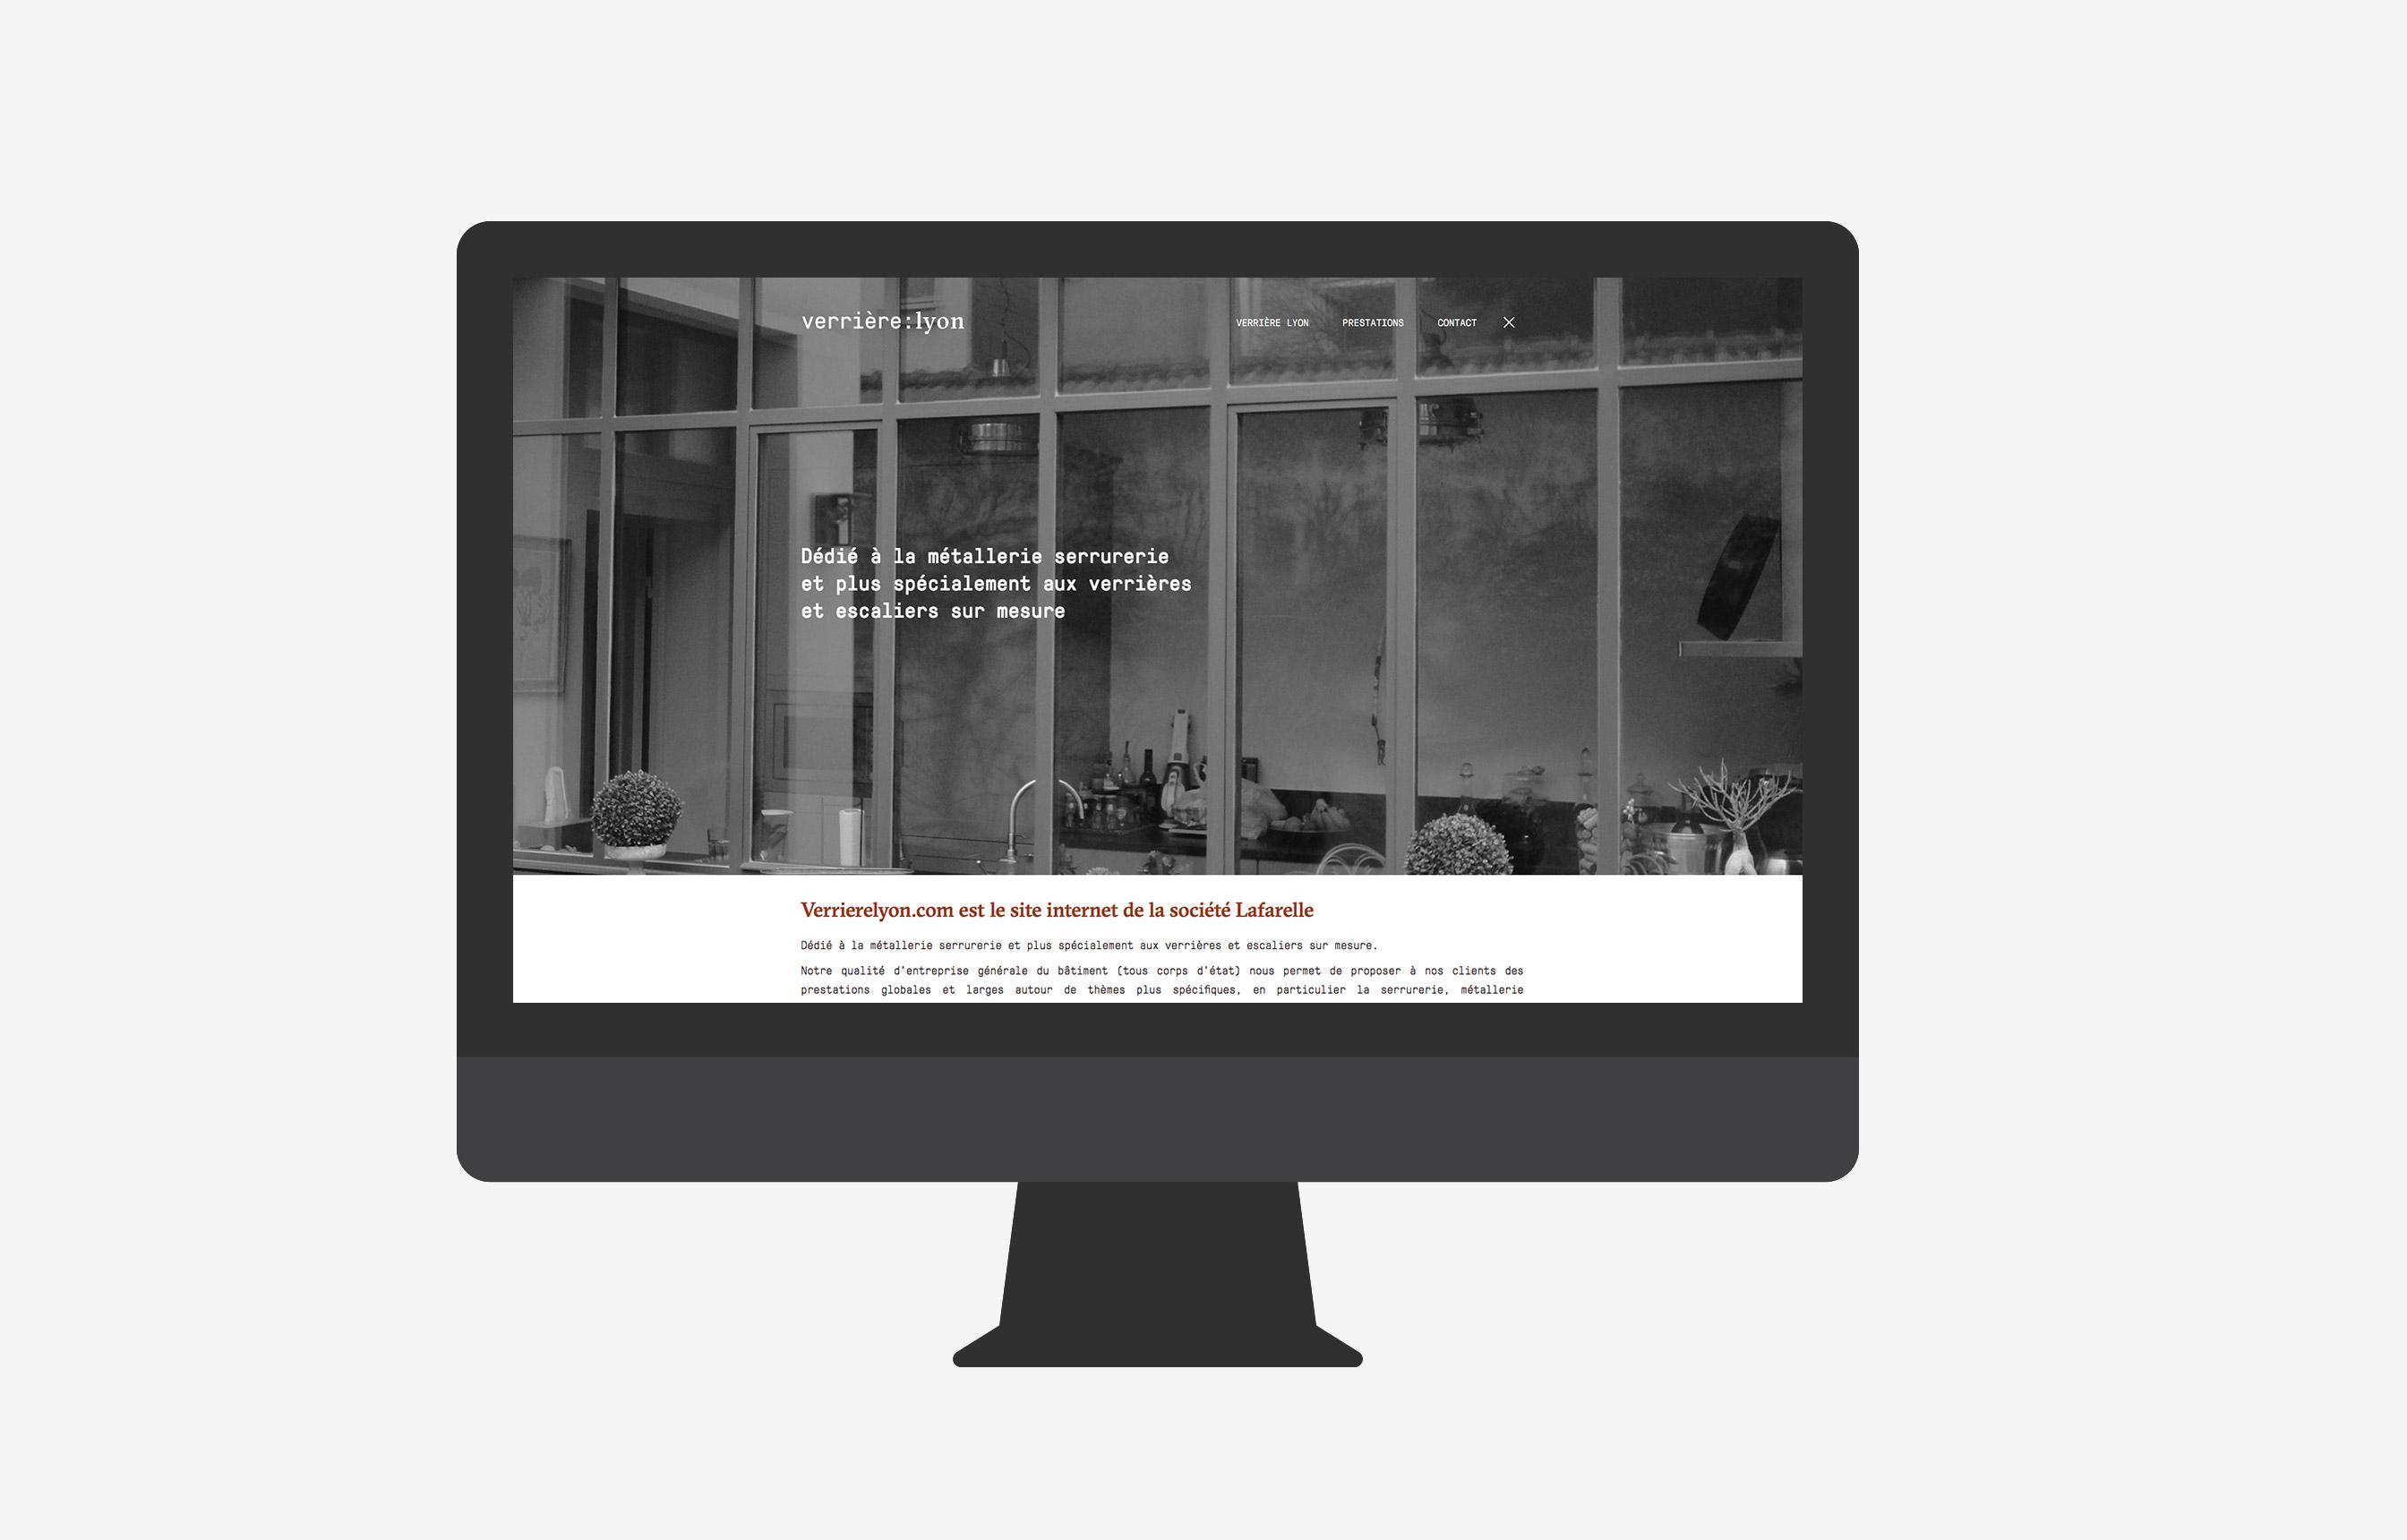 01-verrierelyon-pikteo-webdesign-graphic-design-freelance-paris-bruxelles-londres